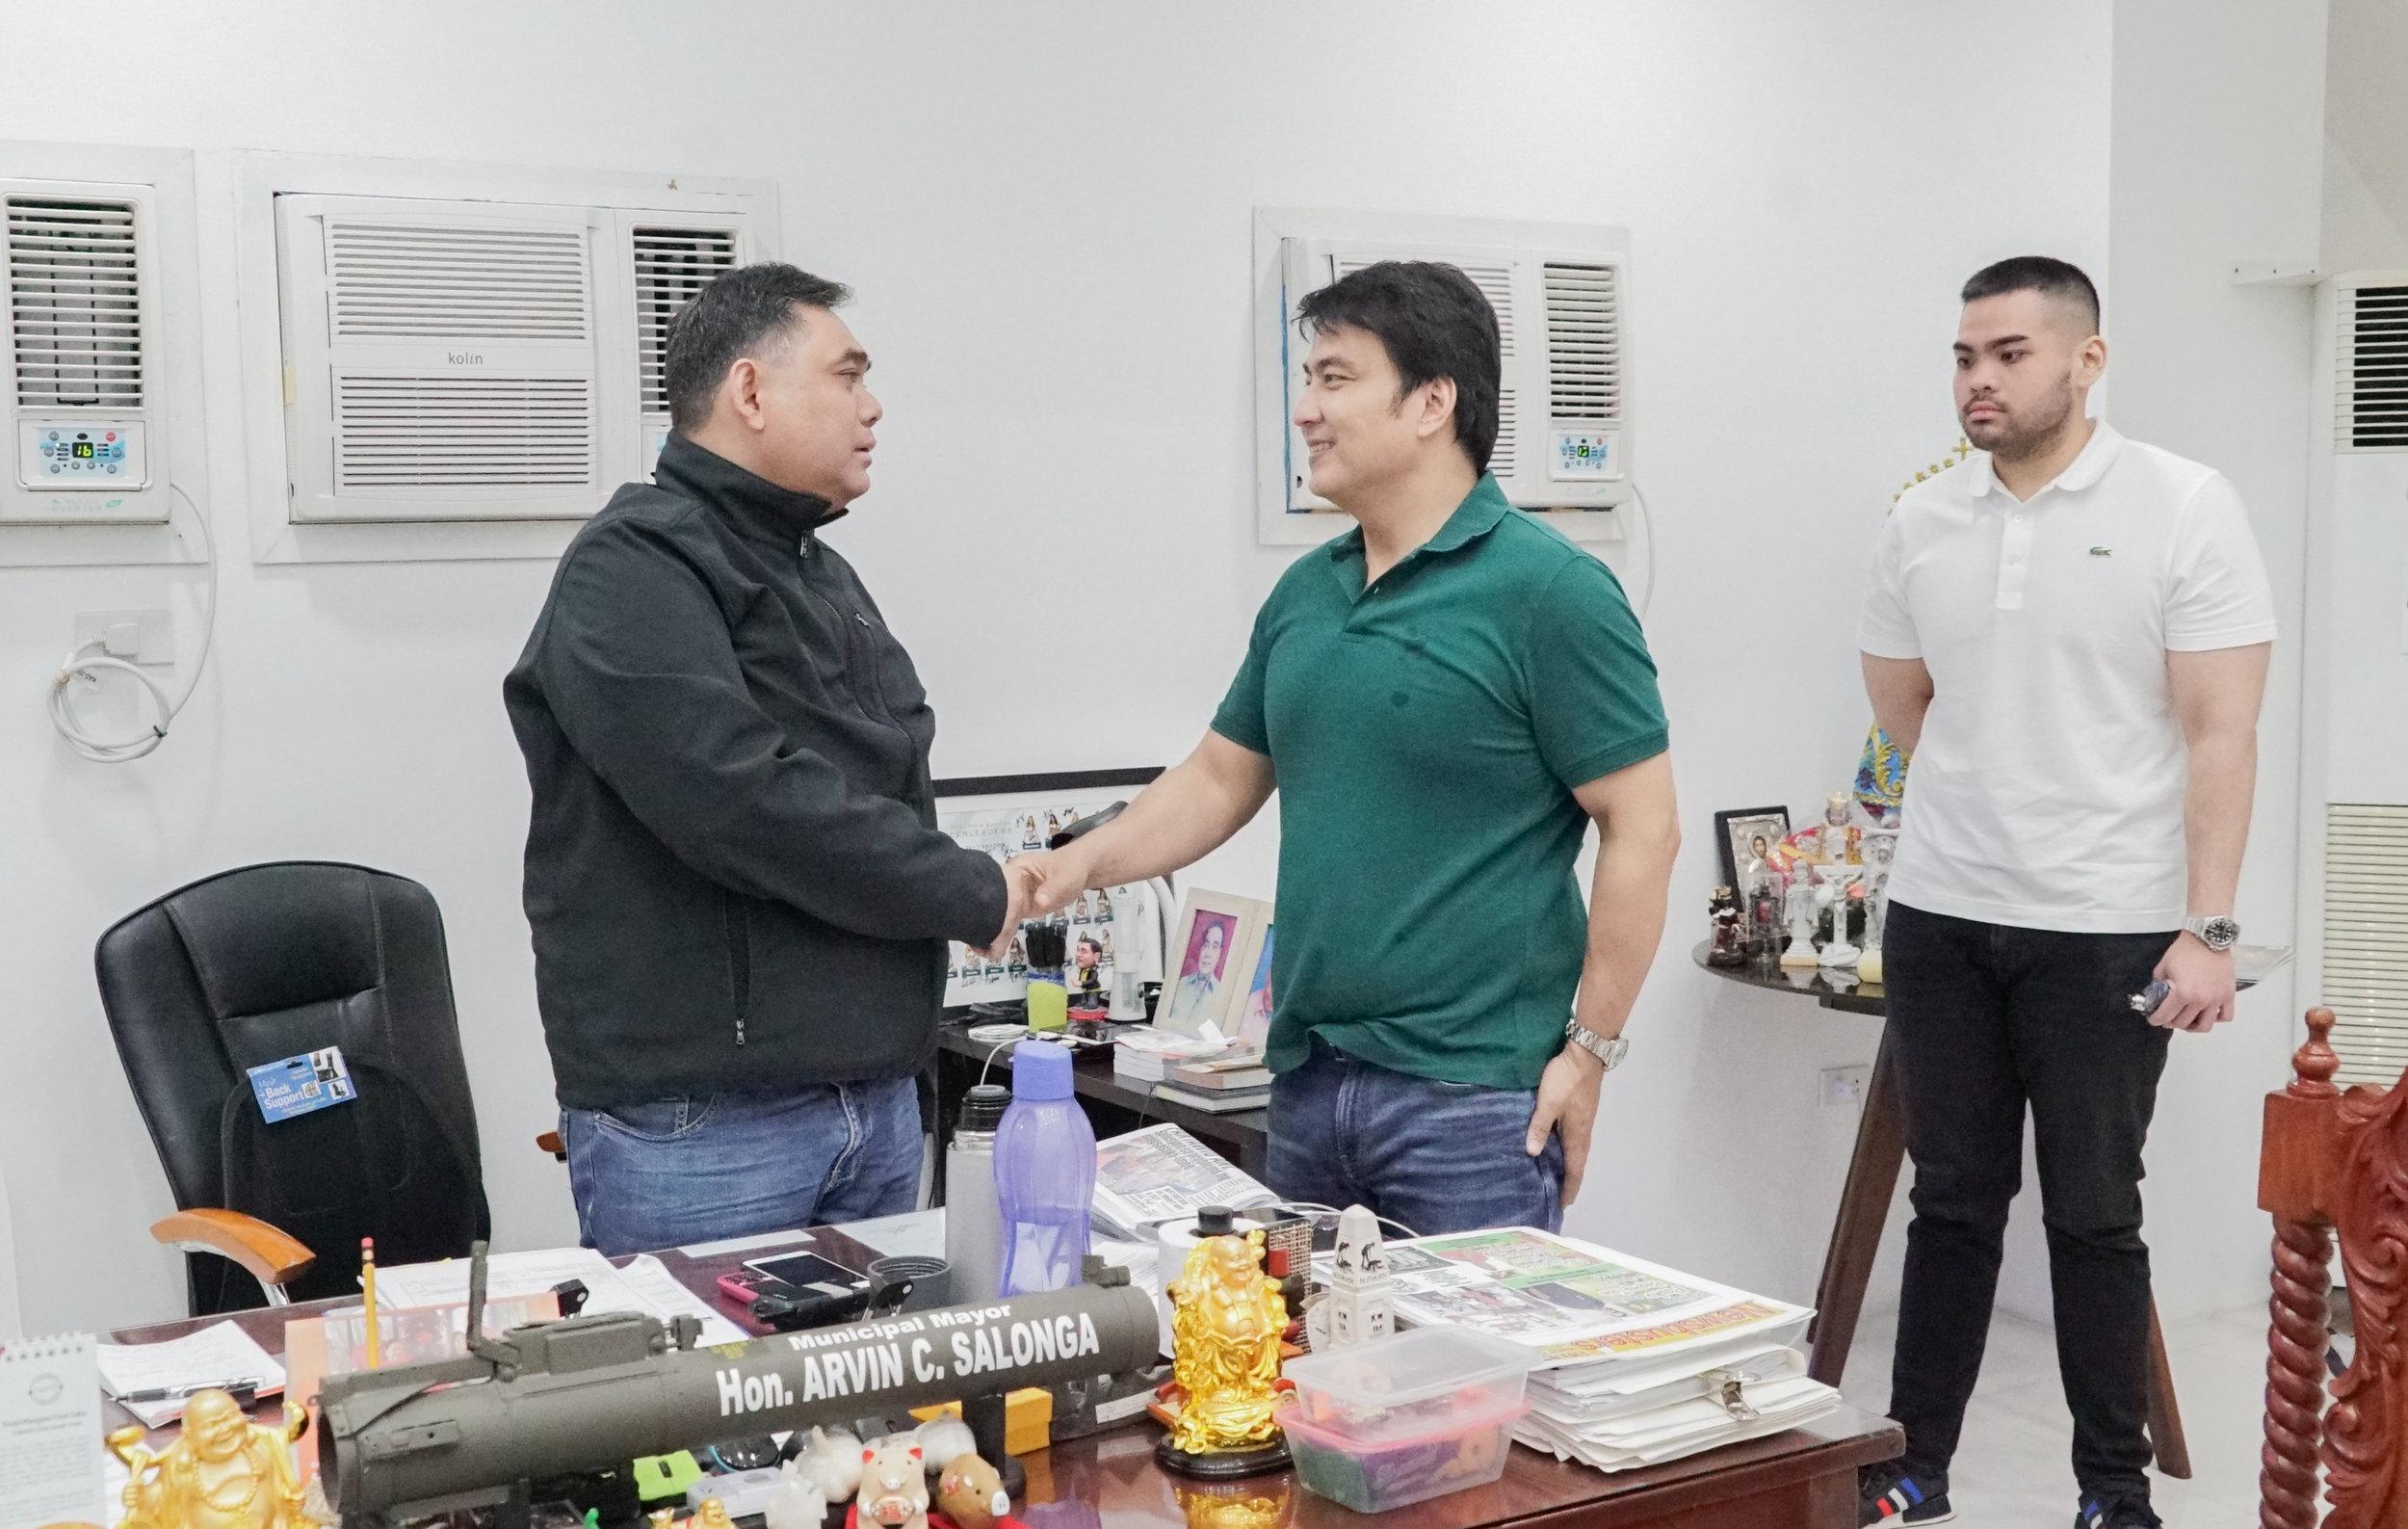 Mayor Arvin Salonga, Nueva Ecija - January 16, 2019